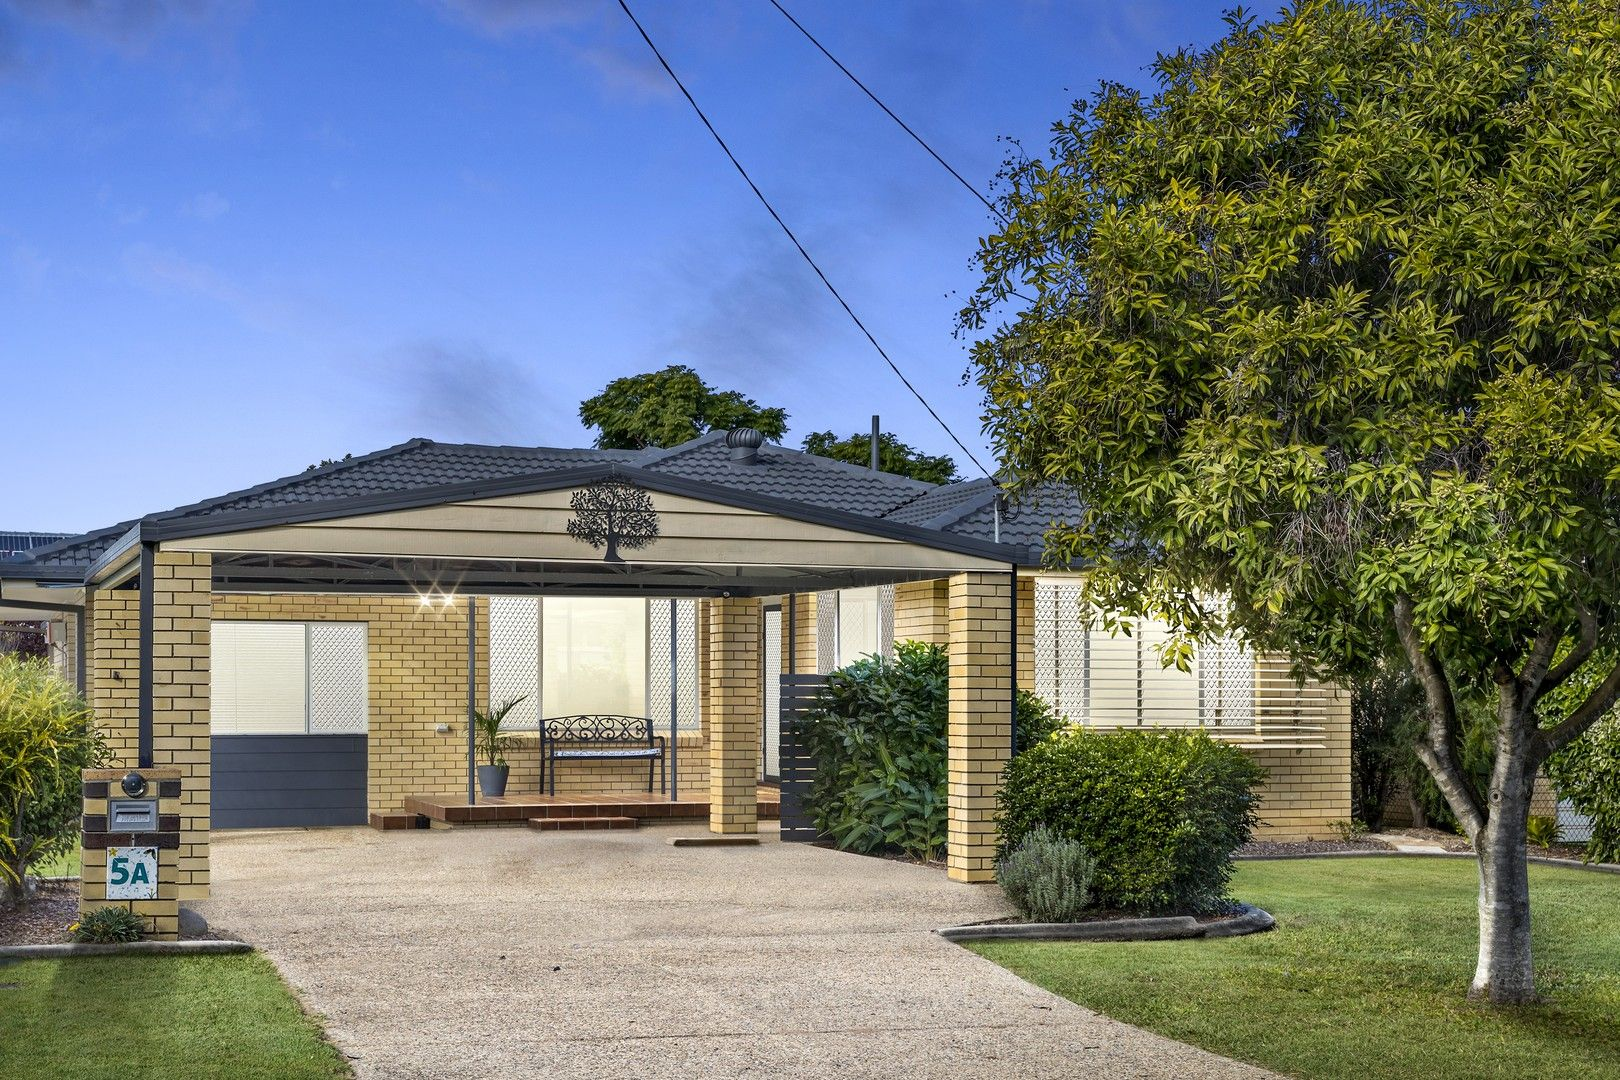 5A Deborah Street, Clontarf QLD 4019, Image 0